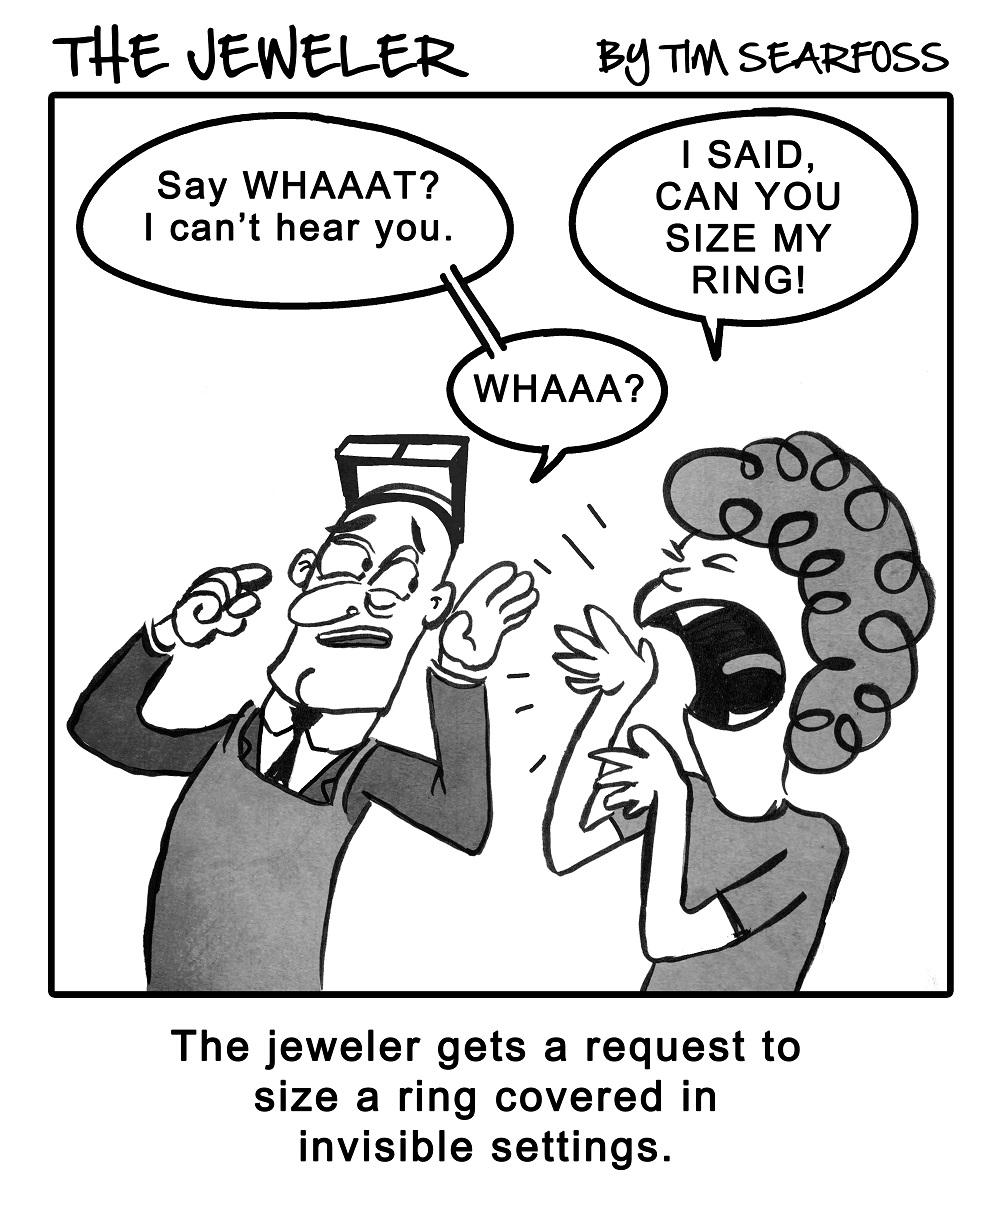 Cartoon: The Jeweler Hears What He Wants to Hear